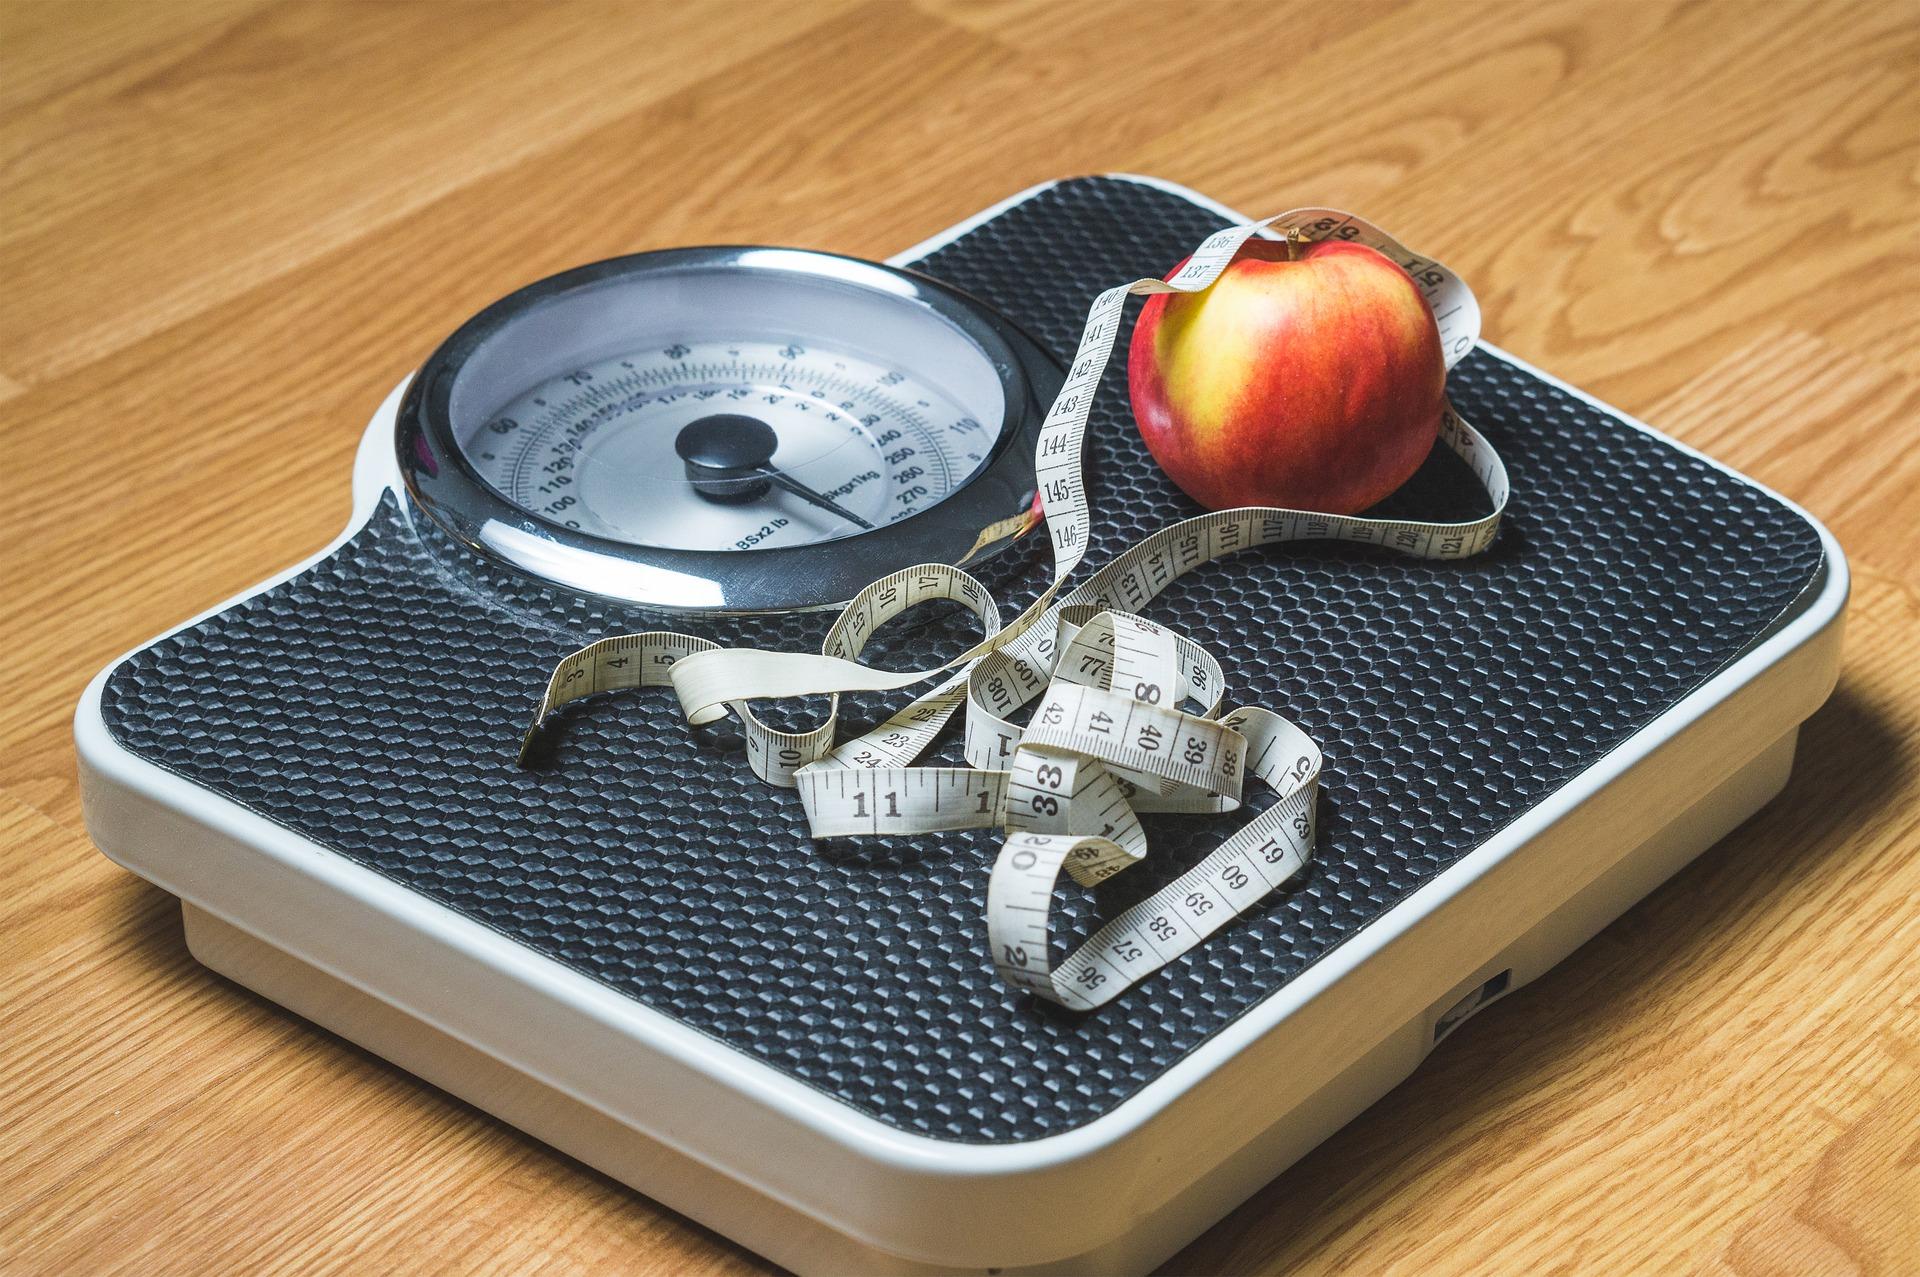 Váha s jablkom a metrom